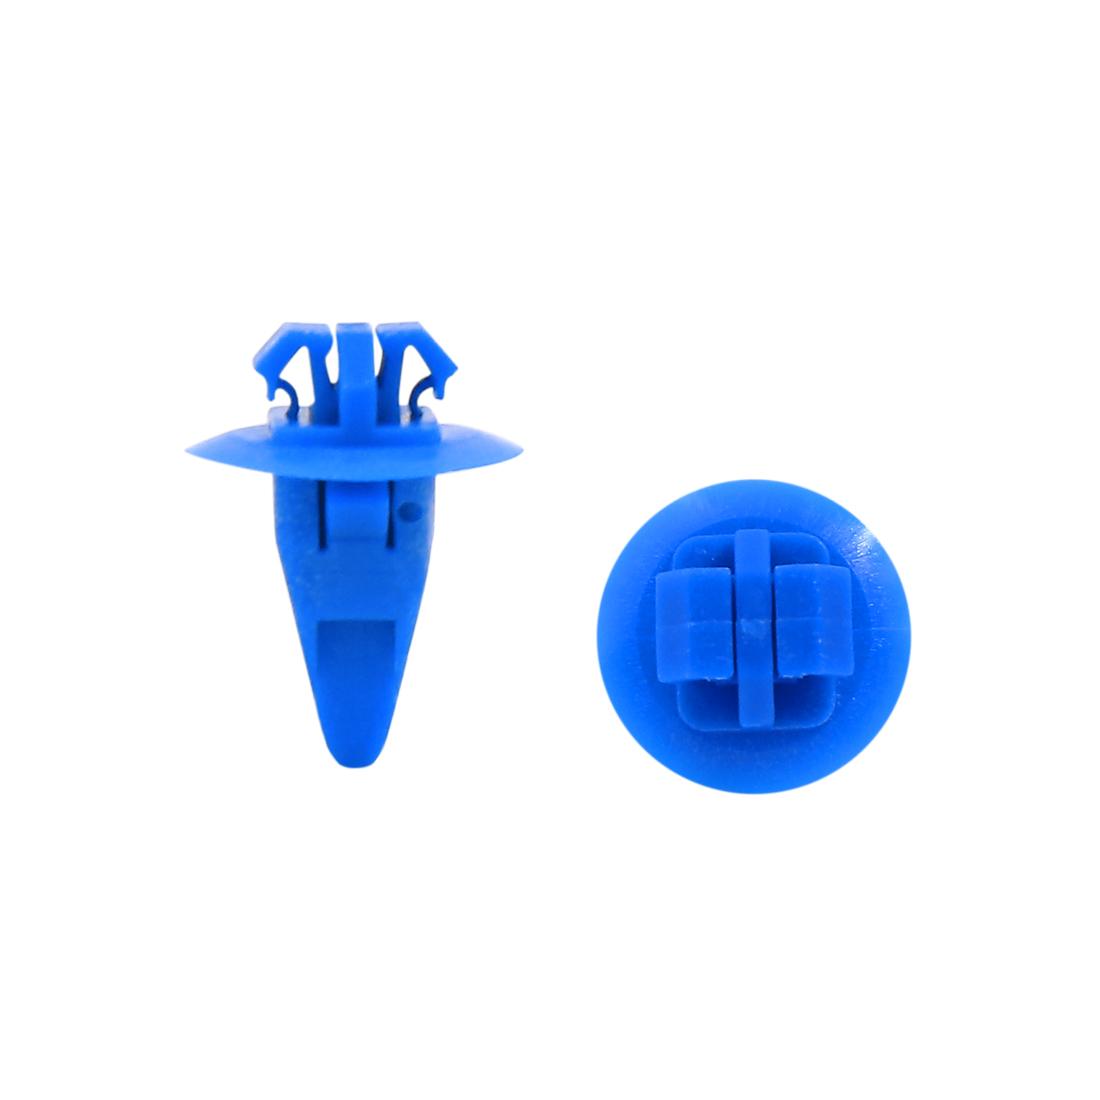 100Pcs 10mm x 8mm Hole Dia Clips Plastic Push Type Rivet Fastener Bumper Pin